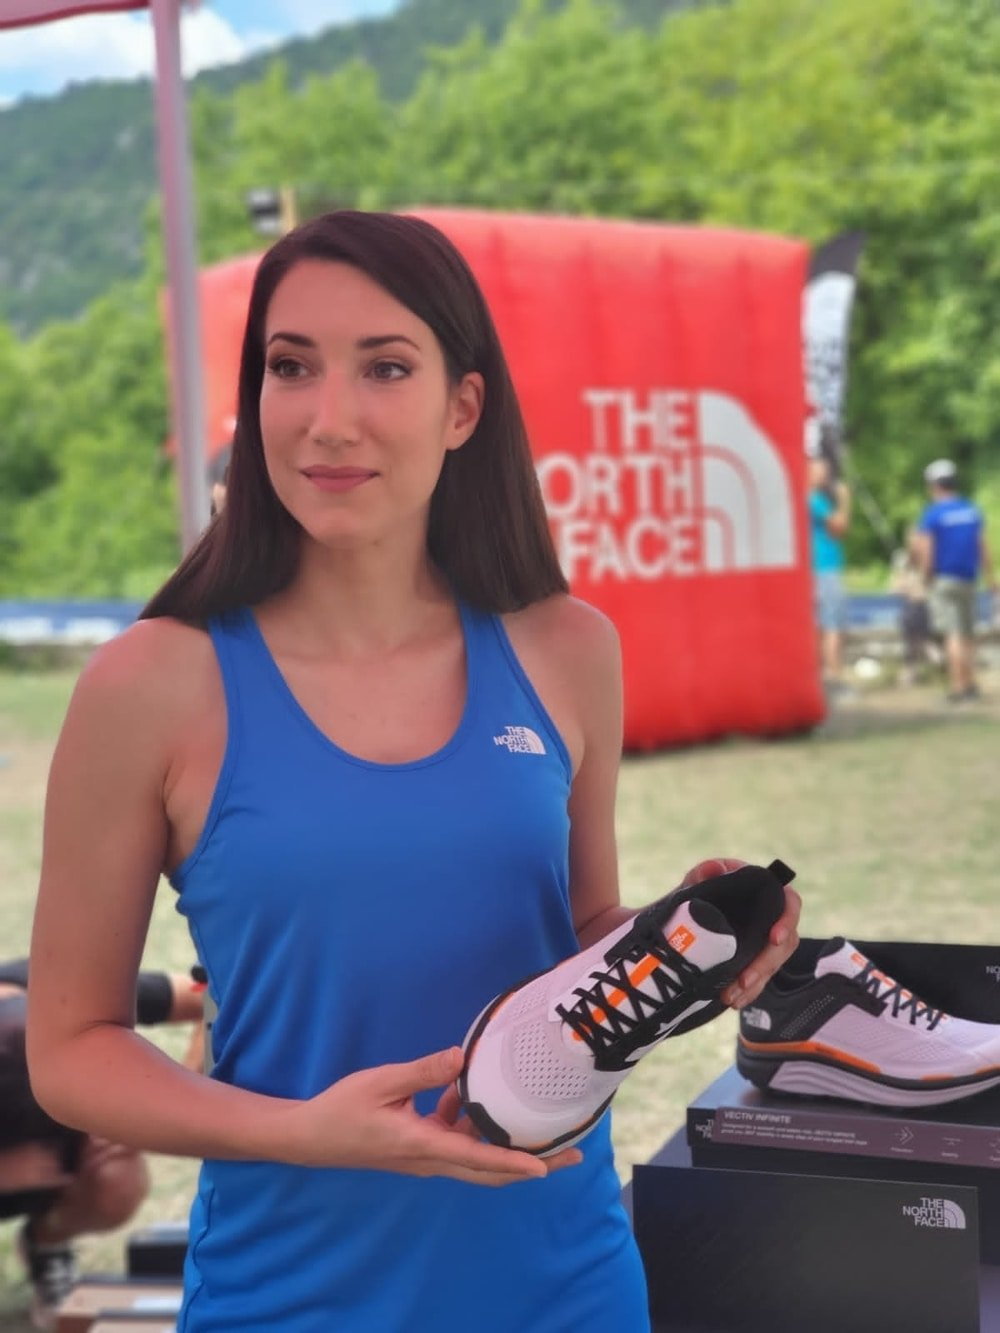 Nous avons couru avec The North Face à Zagori Mountain Running - itravelling.gr